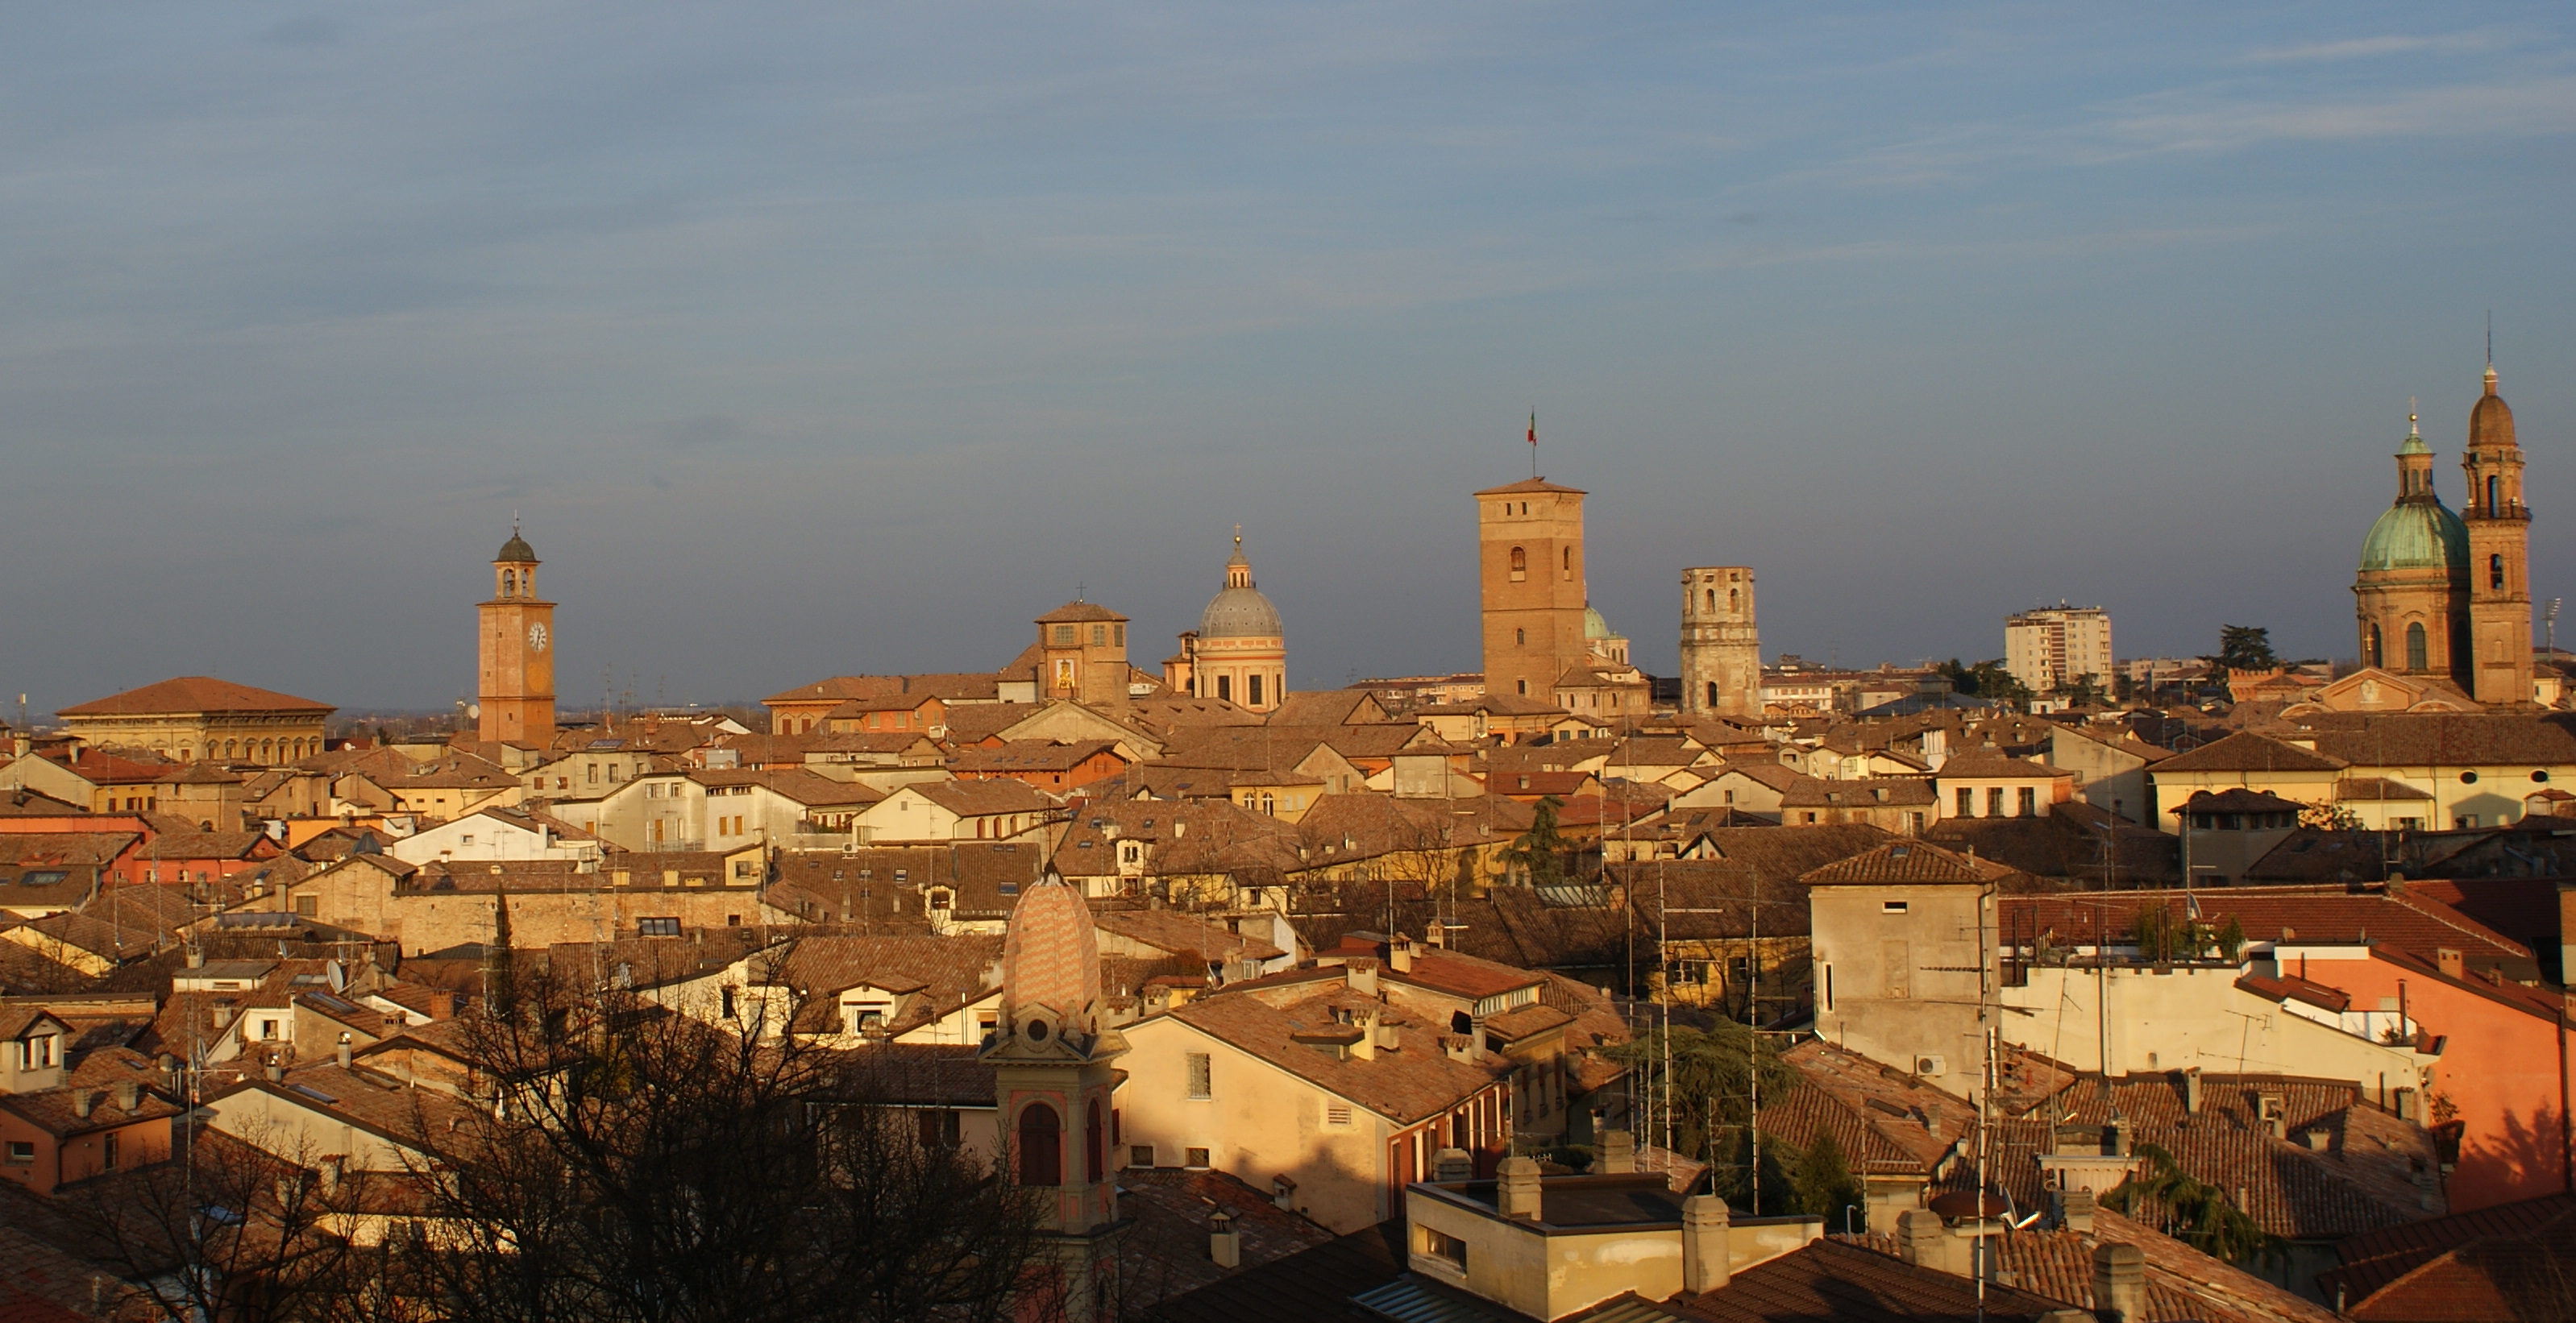 File:Reggio_Emilia_profilo_panorama on Schools Education